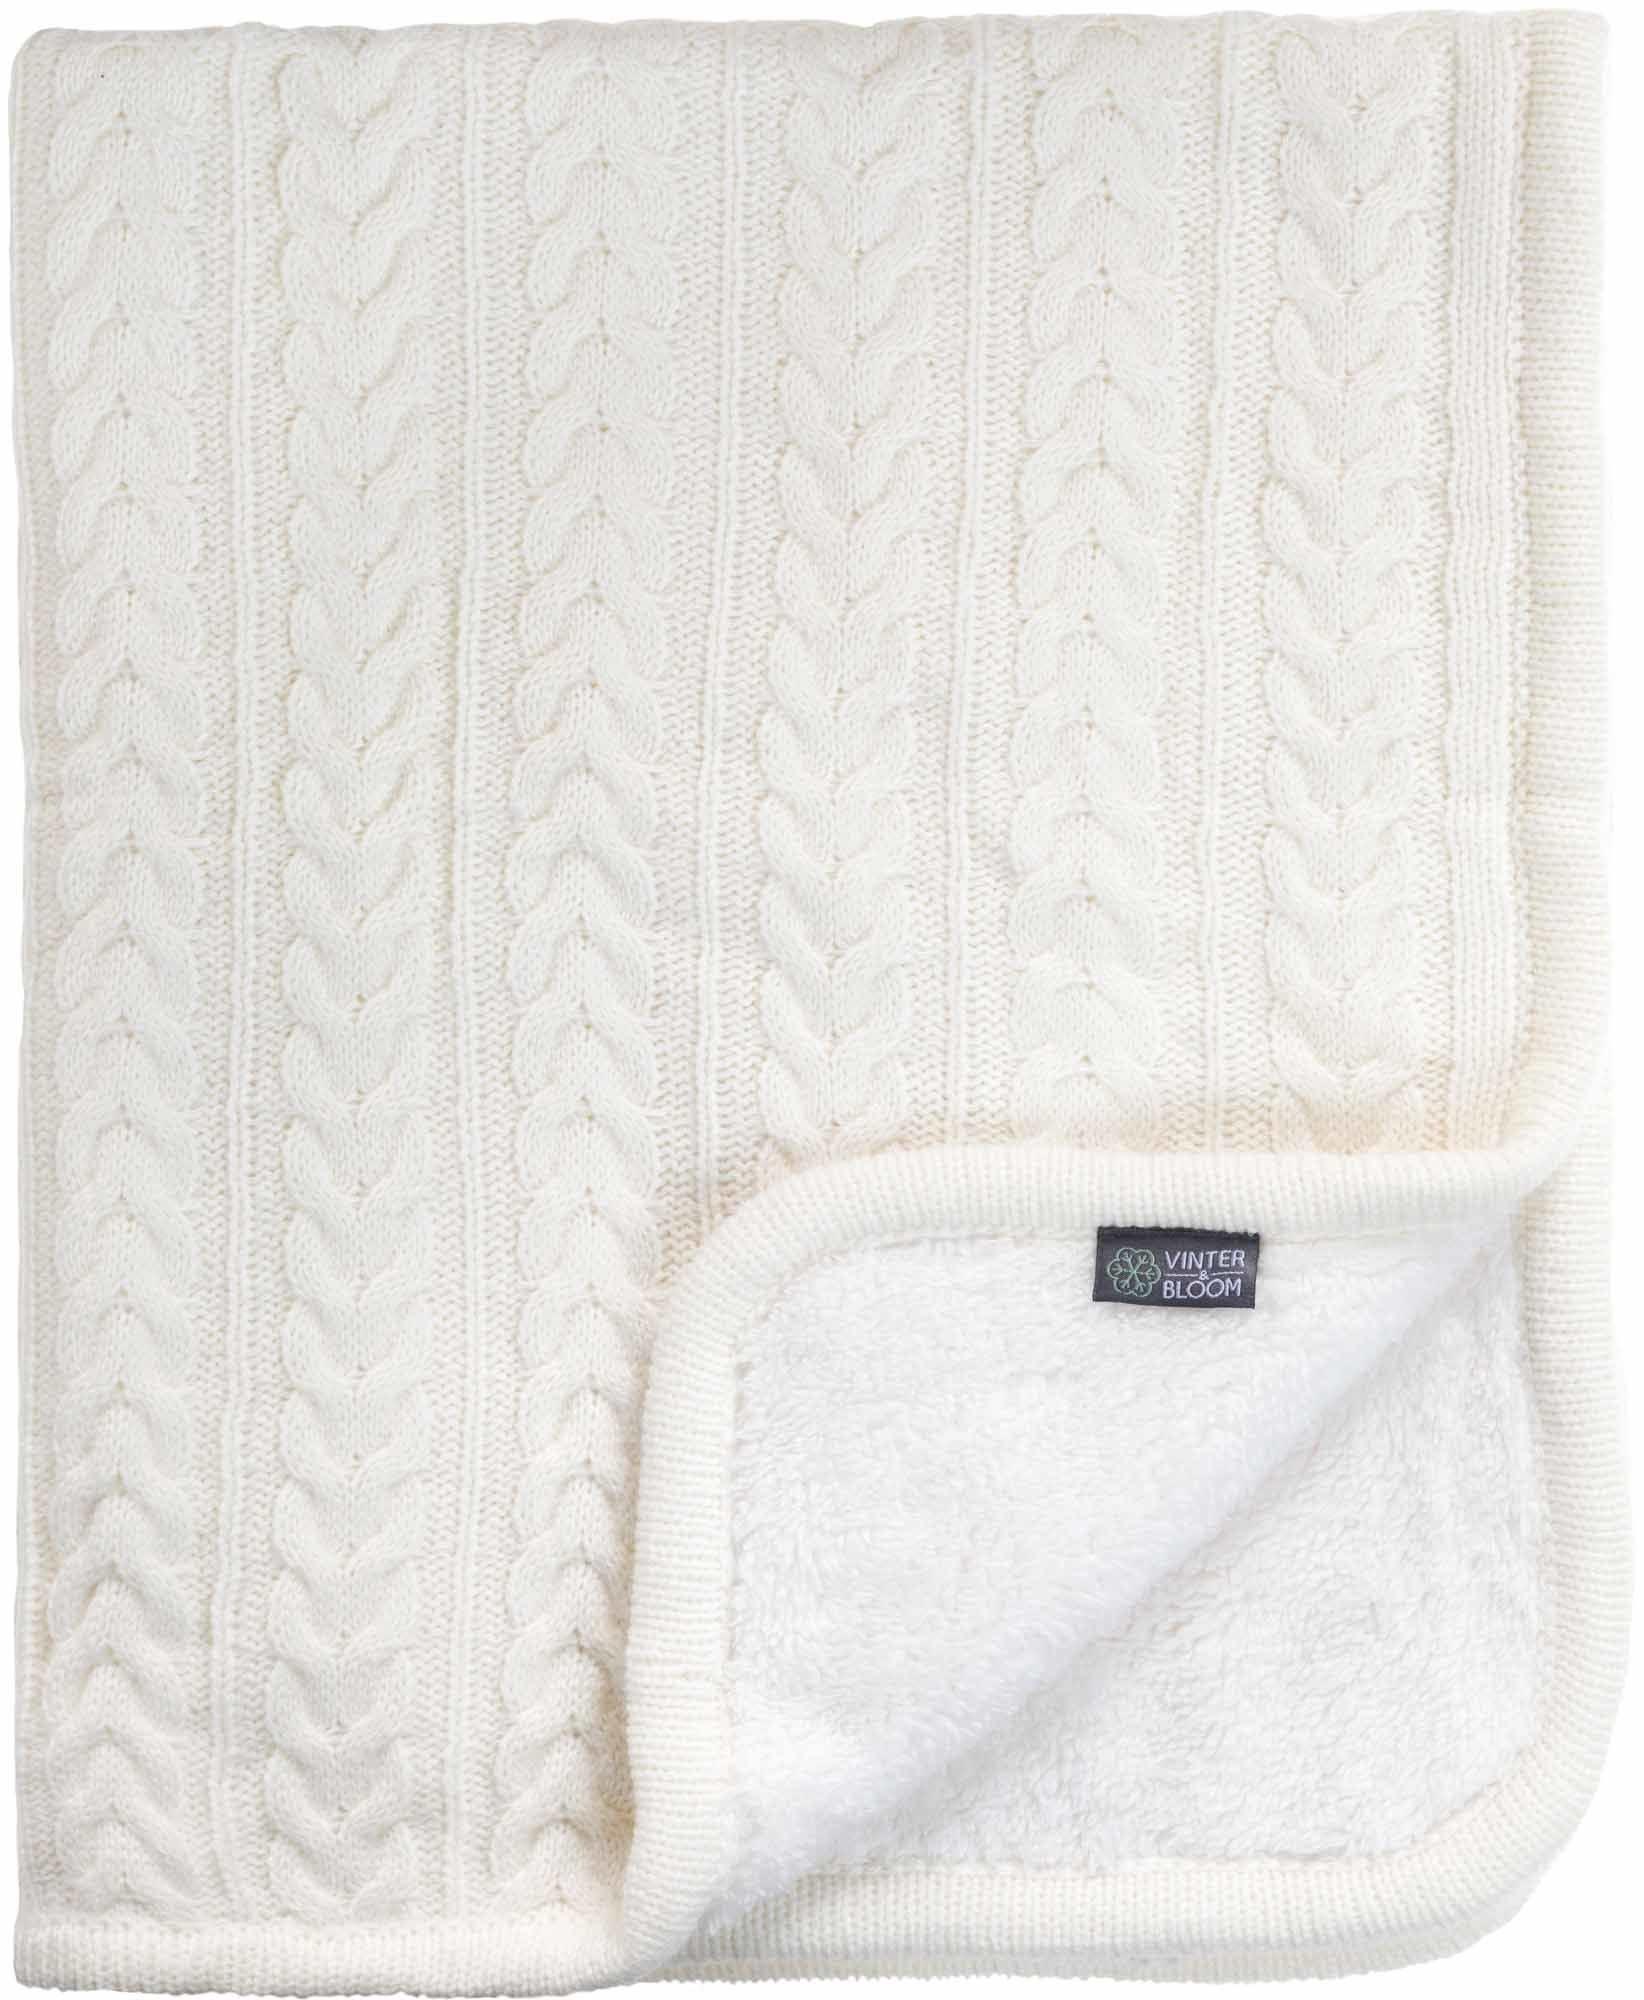 Vinter & Bloom Viltti Cuddly, Ivory